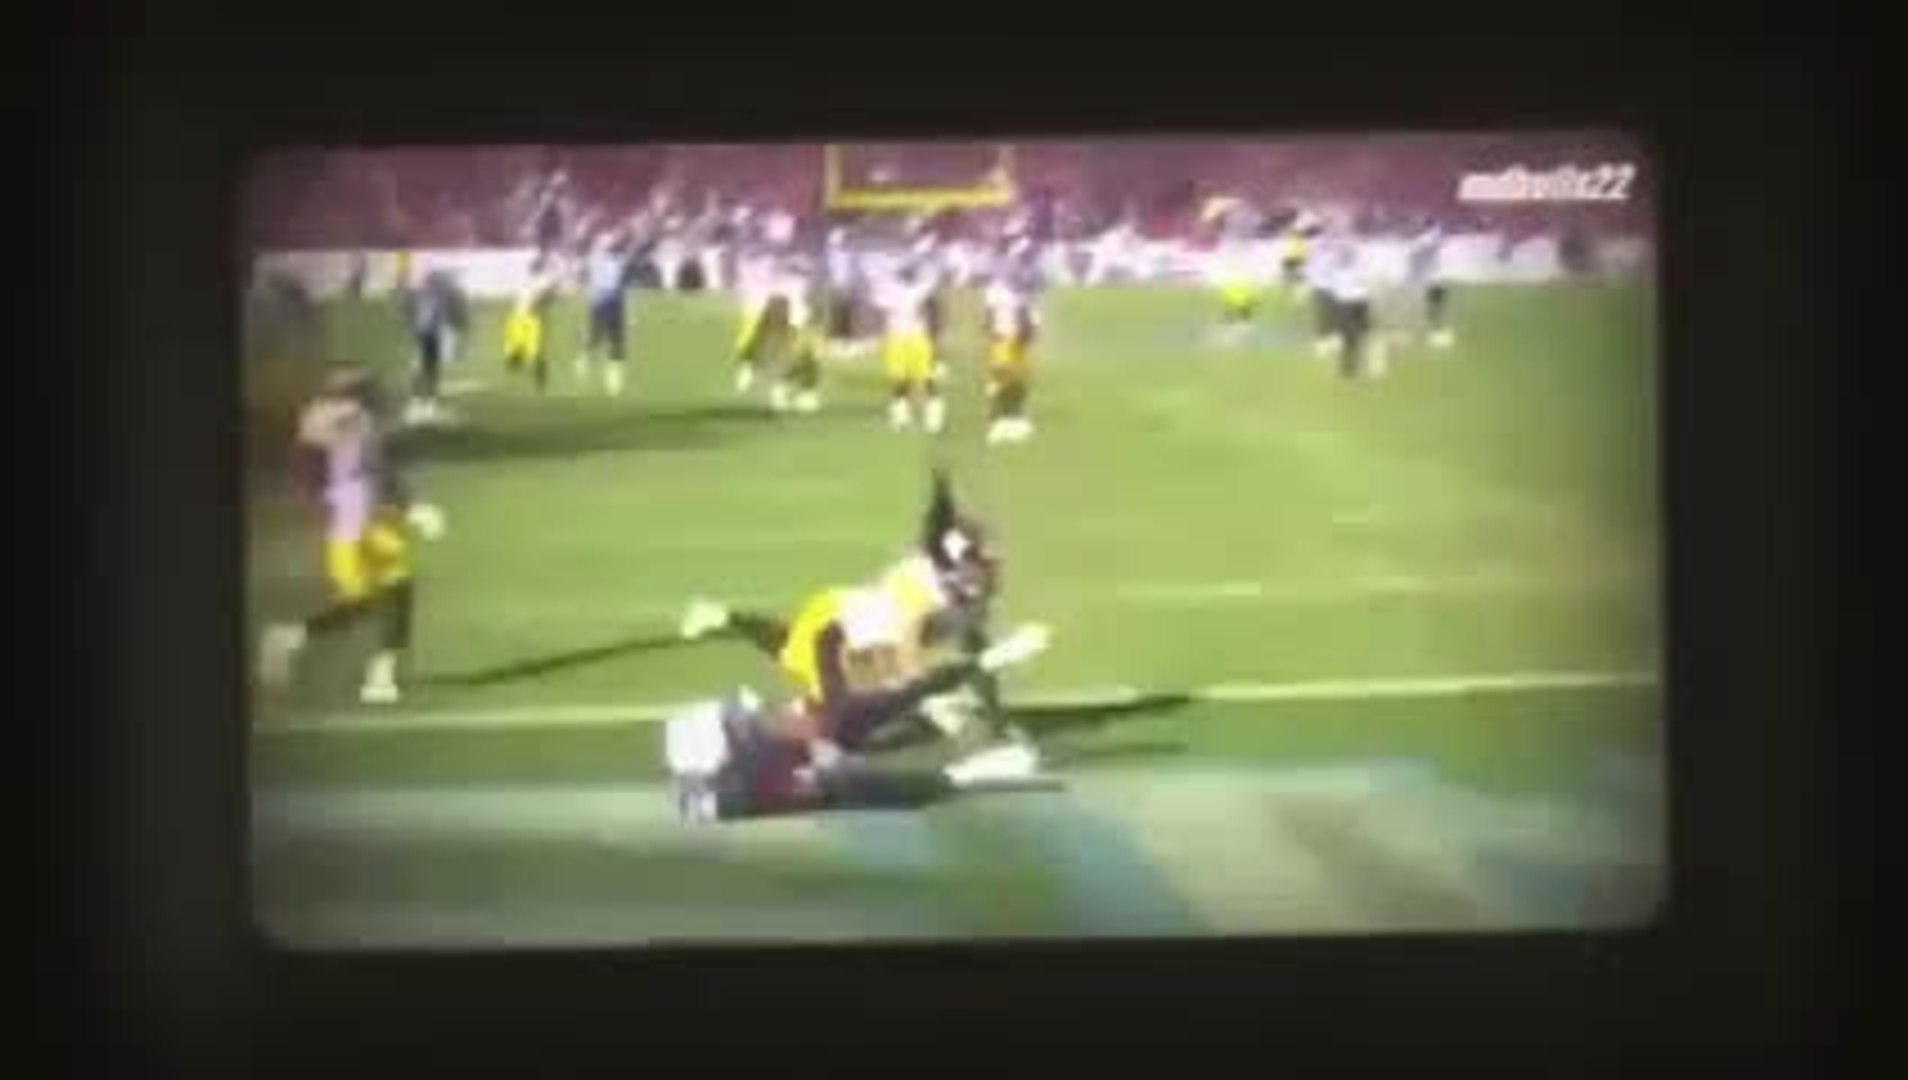 Cowboys v Rams Week 3 highlights - sunday night on tv - nfl sunday games - sunday football tv - nfl